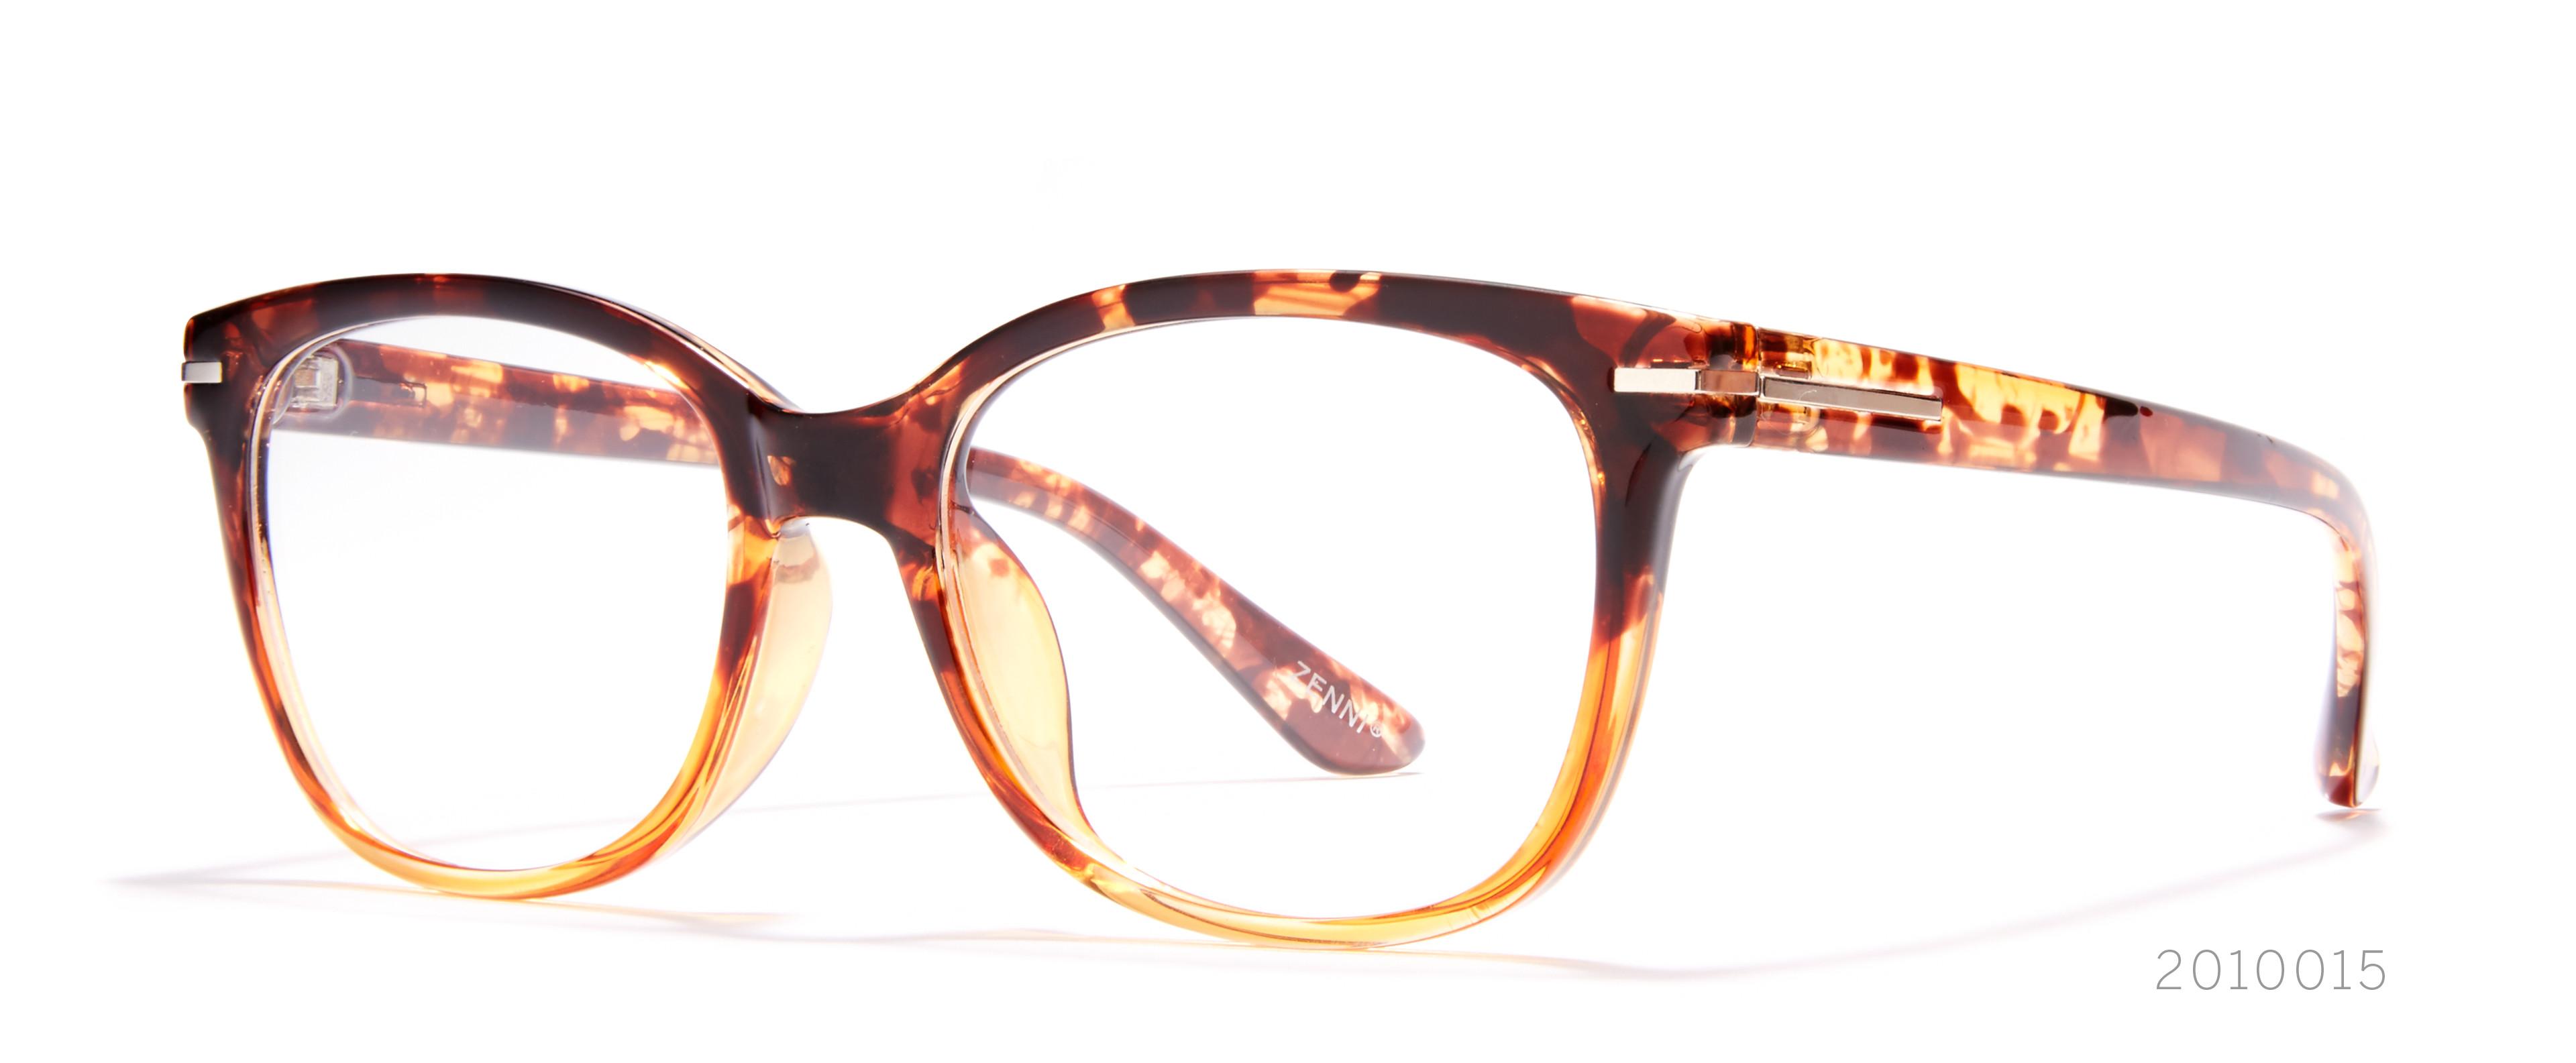 womens statement glasses